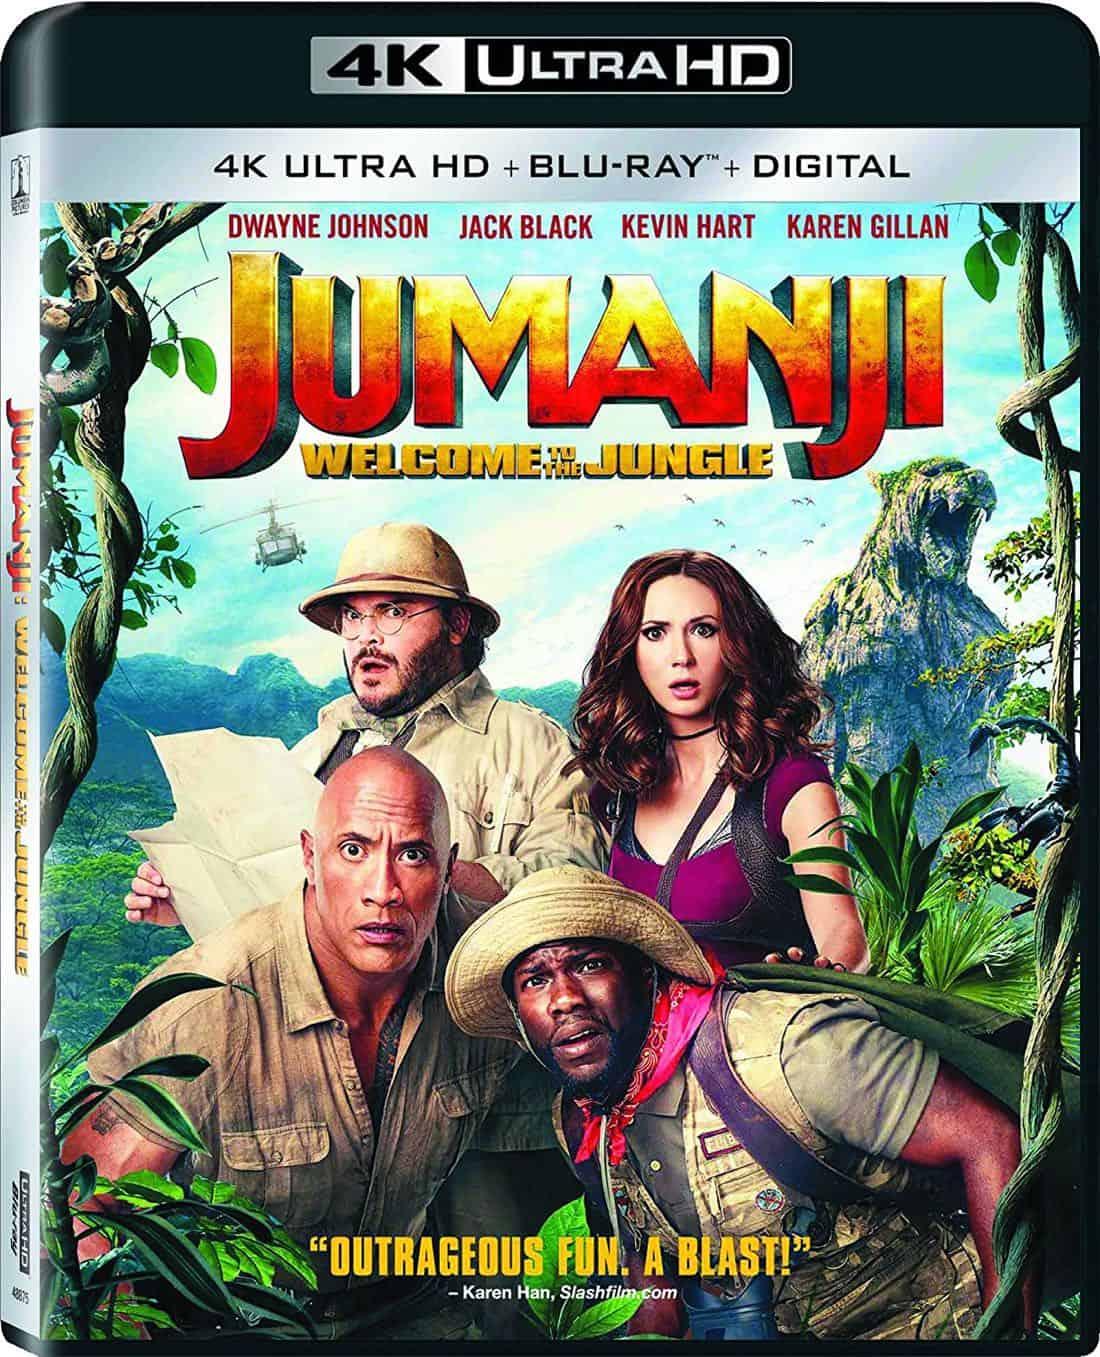 JUMANJI: WELCOME TO THE JUNGLE 4K, Blu-ray And DVD Release